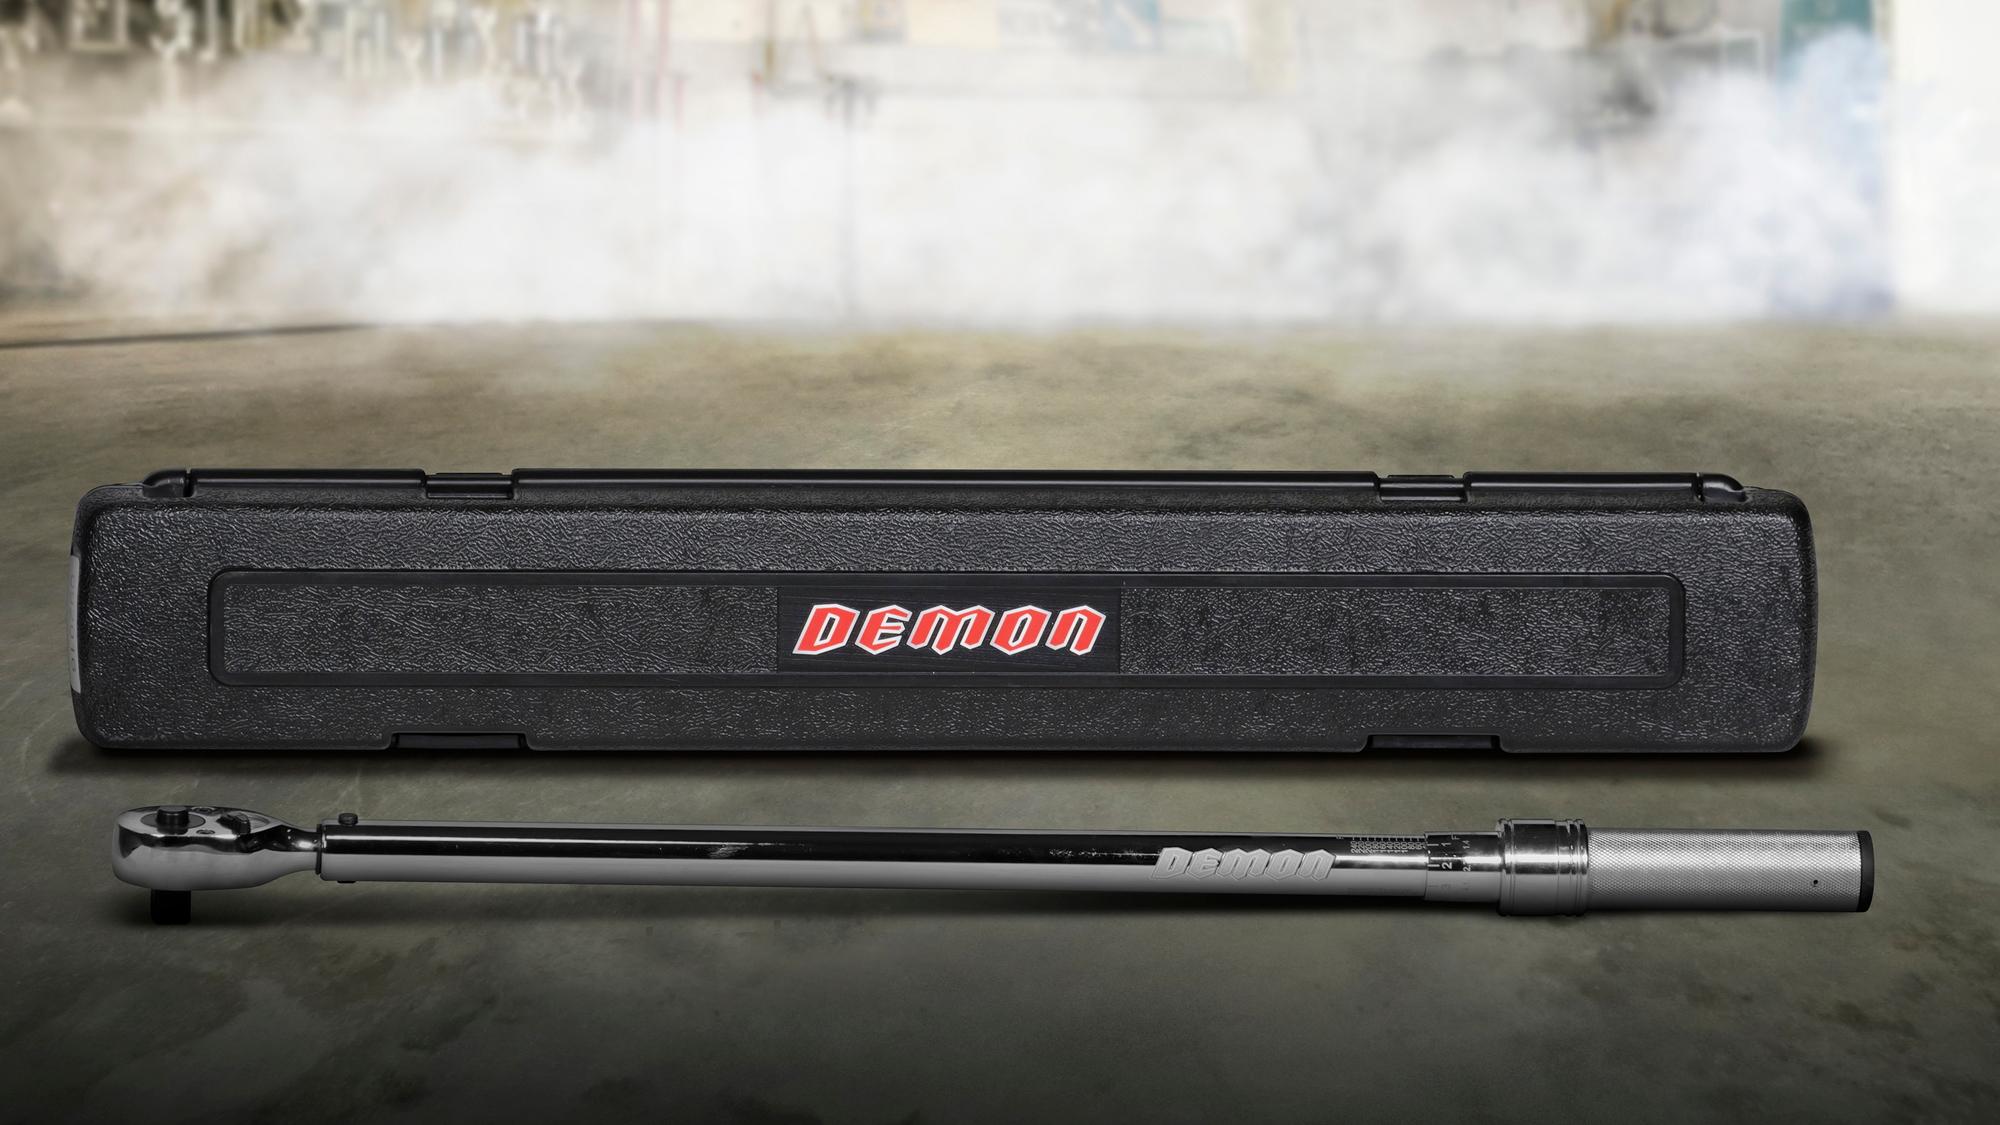 Dodge Demon Crate torque wrench